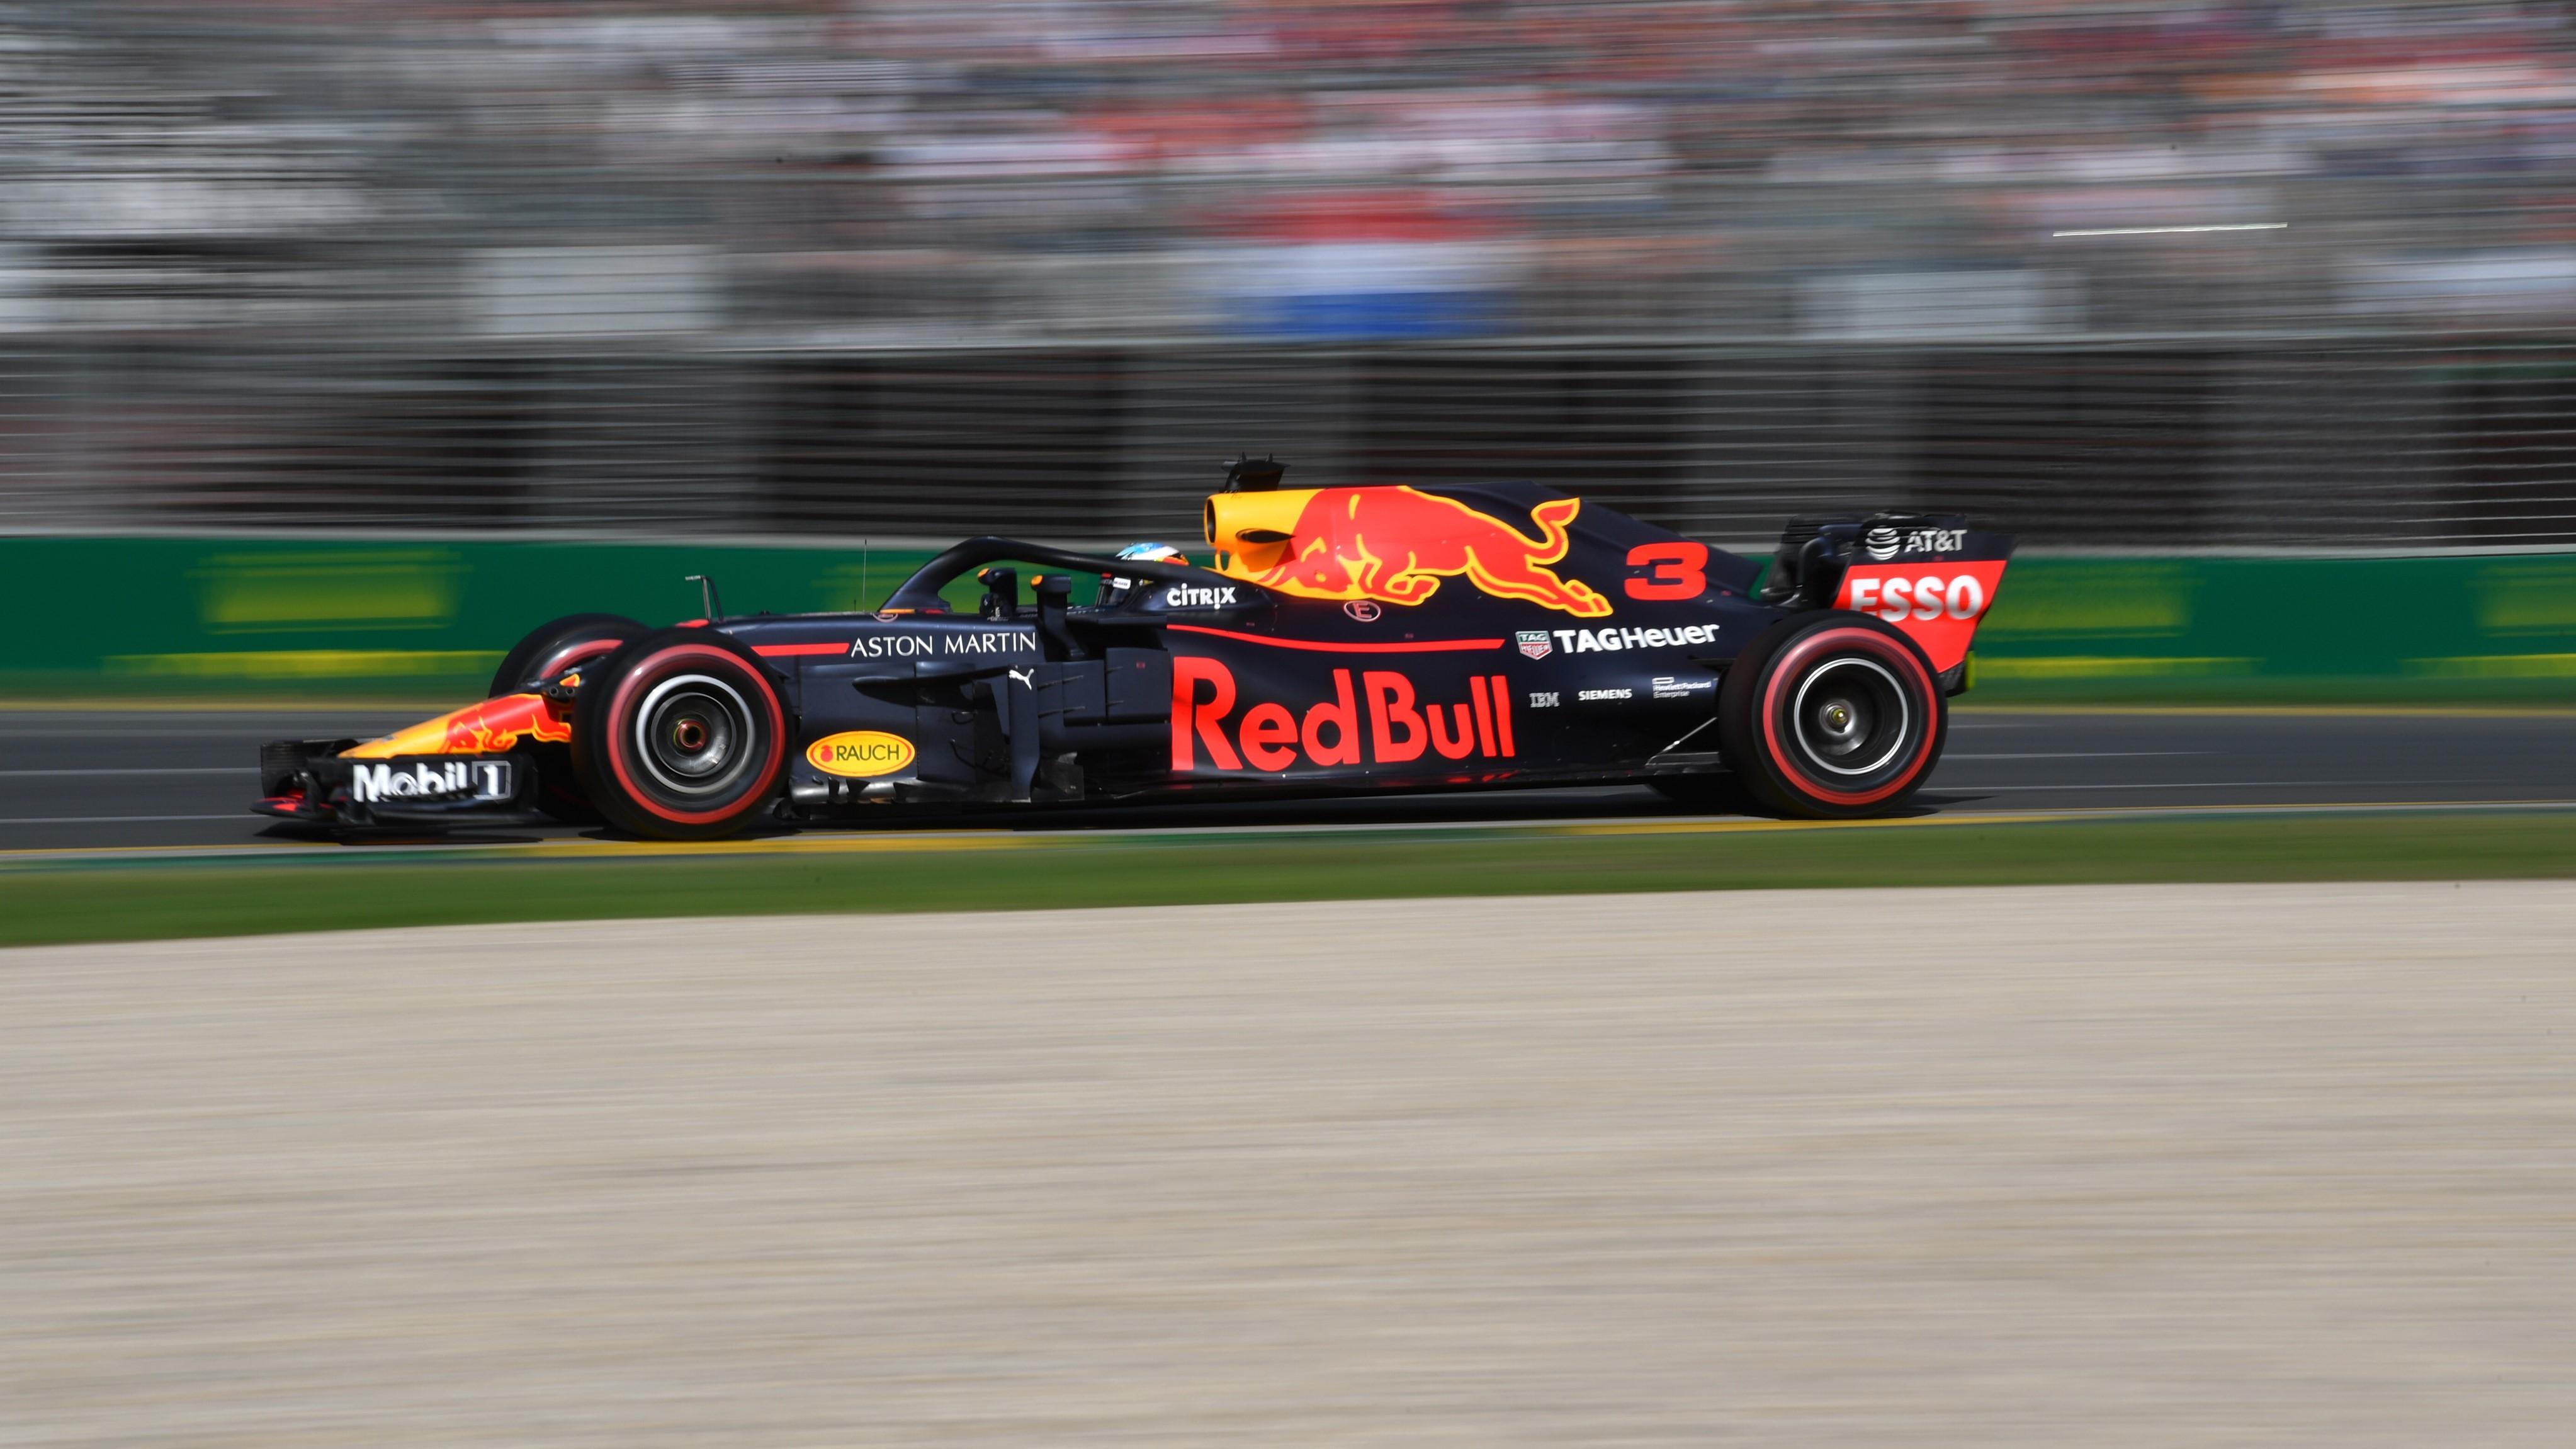 Daniel Ricciardo on his way to fourth place in the 2018 Australian Grand Prix.